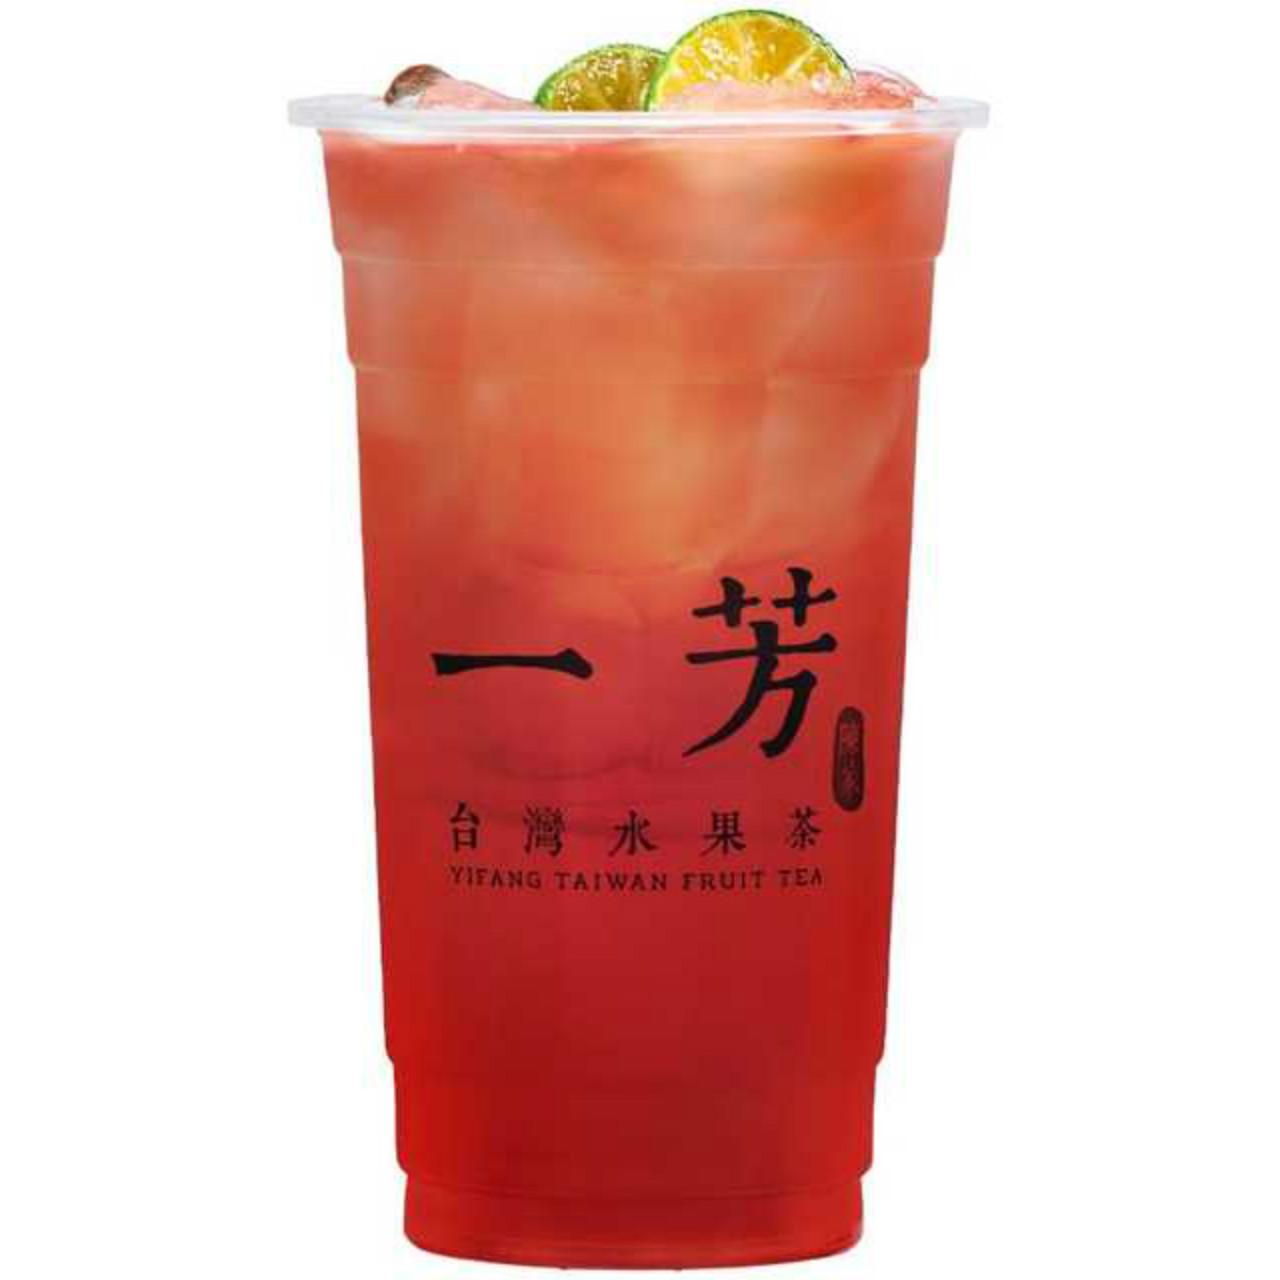 Roselle kumquat green tea